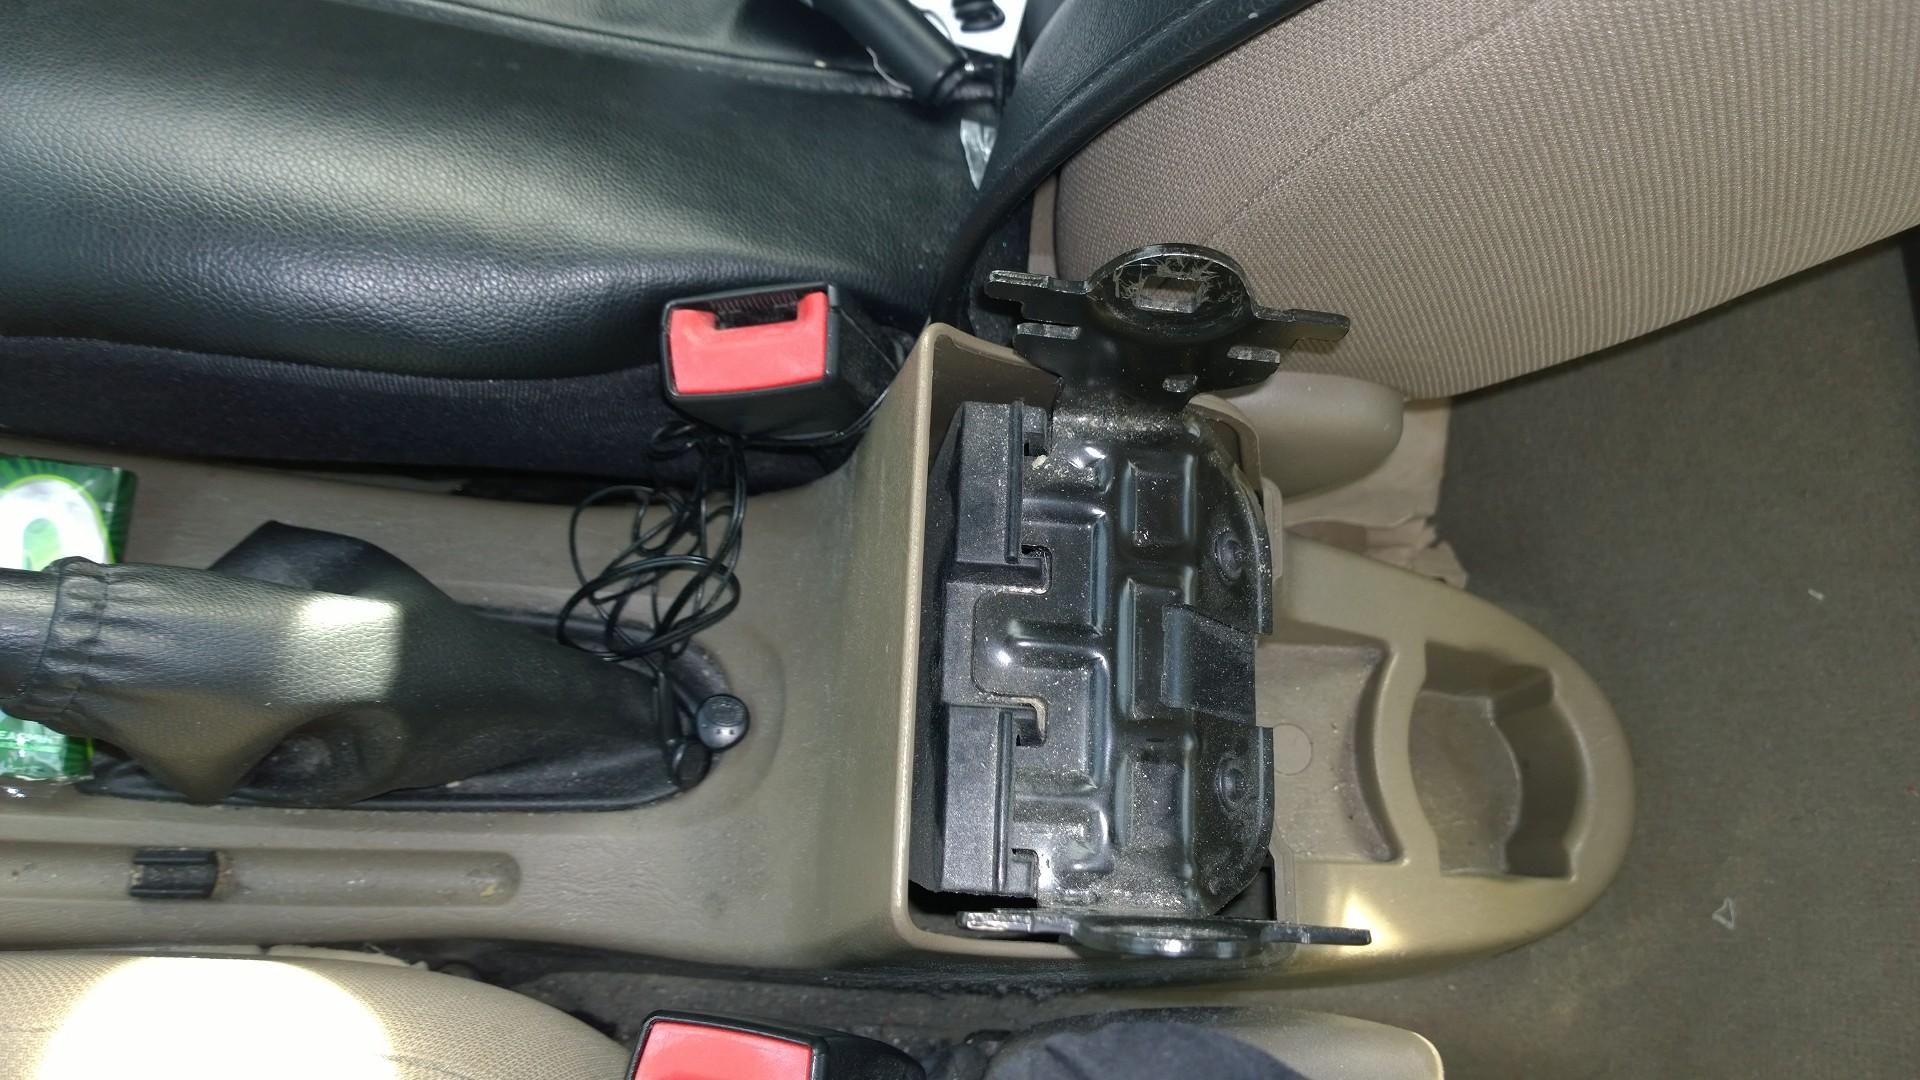 Center console armrest wp_20151227_001 jpg